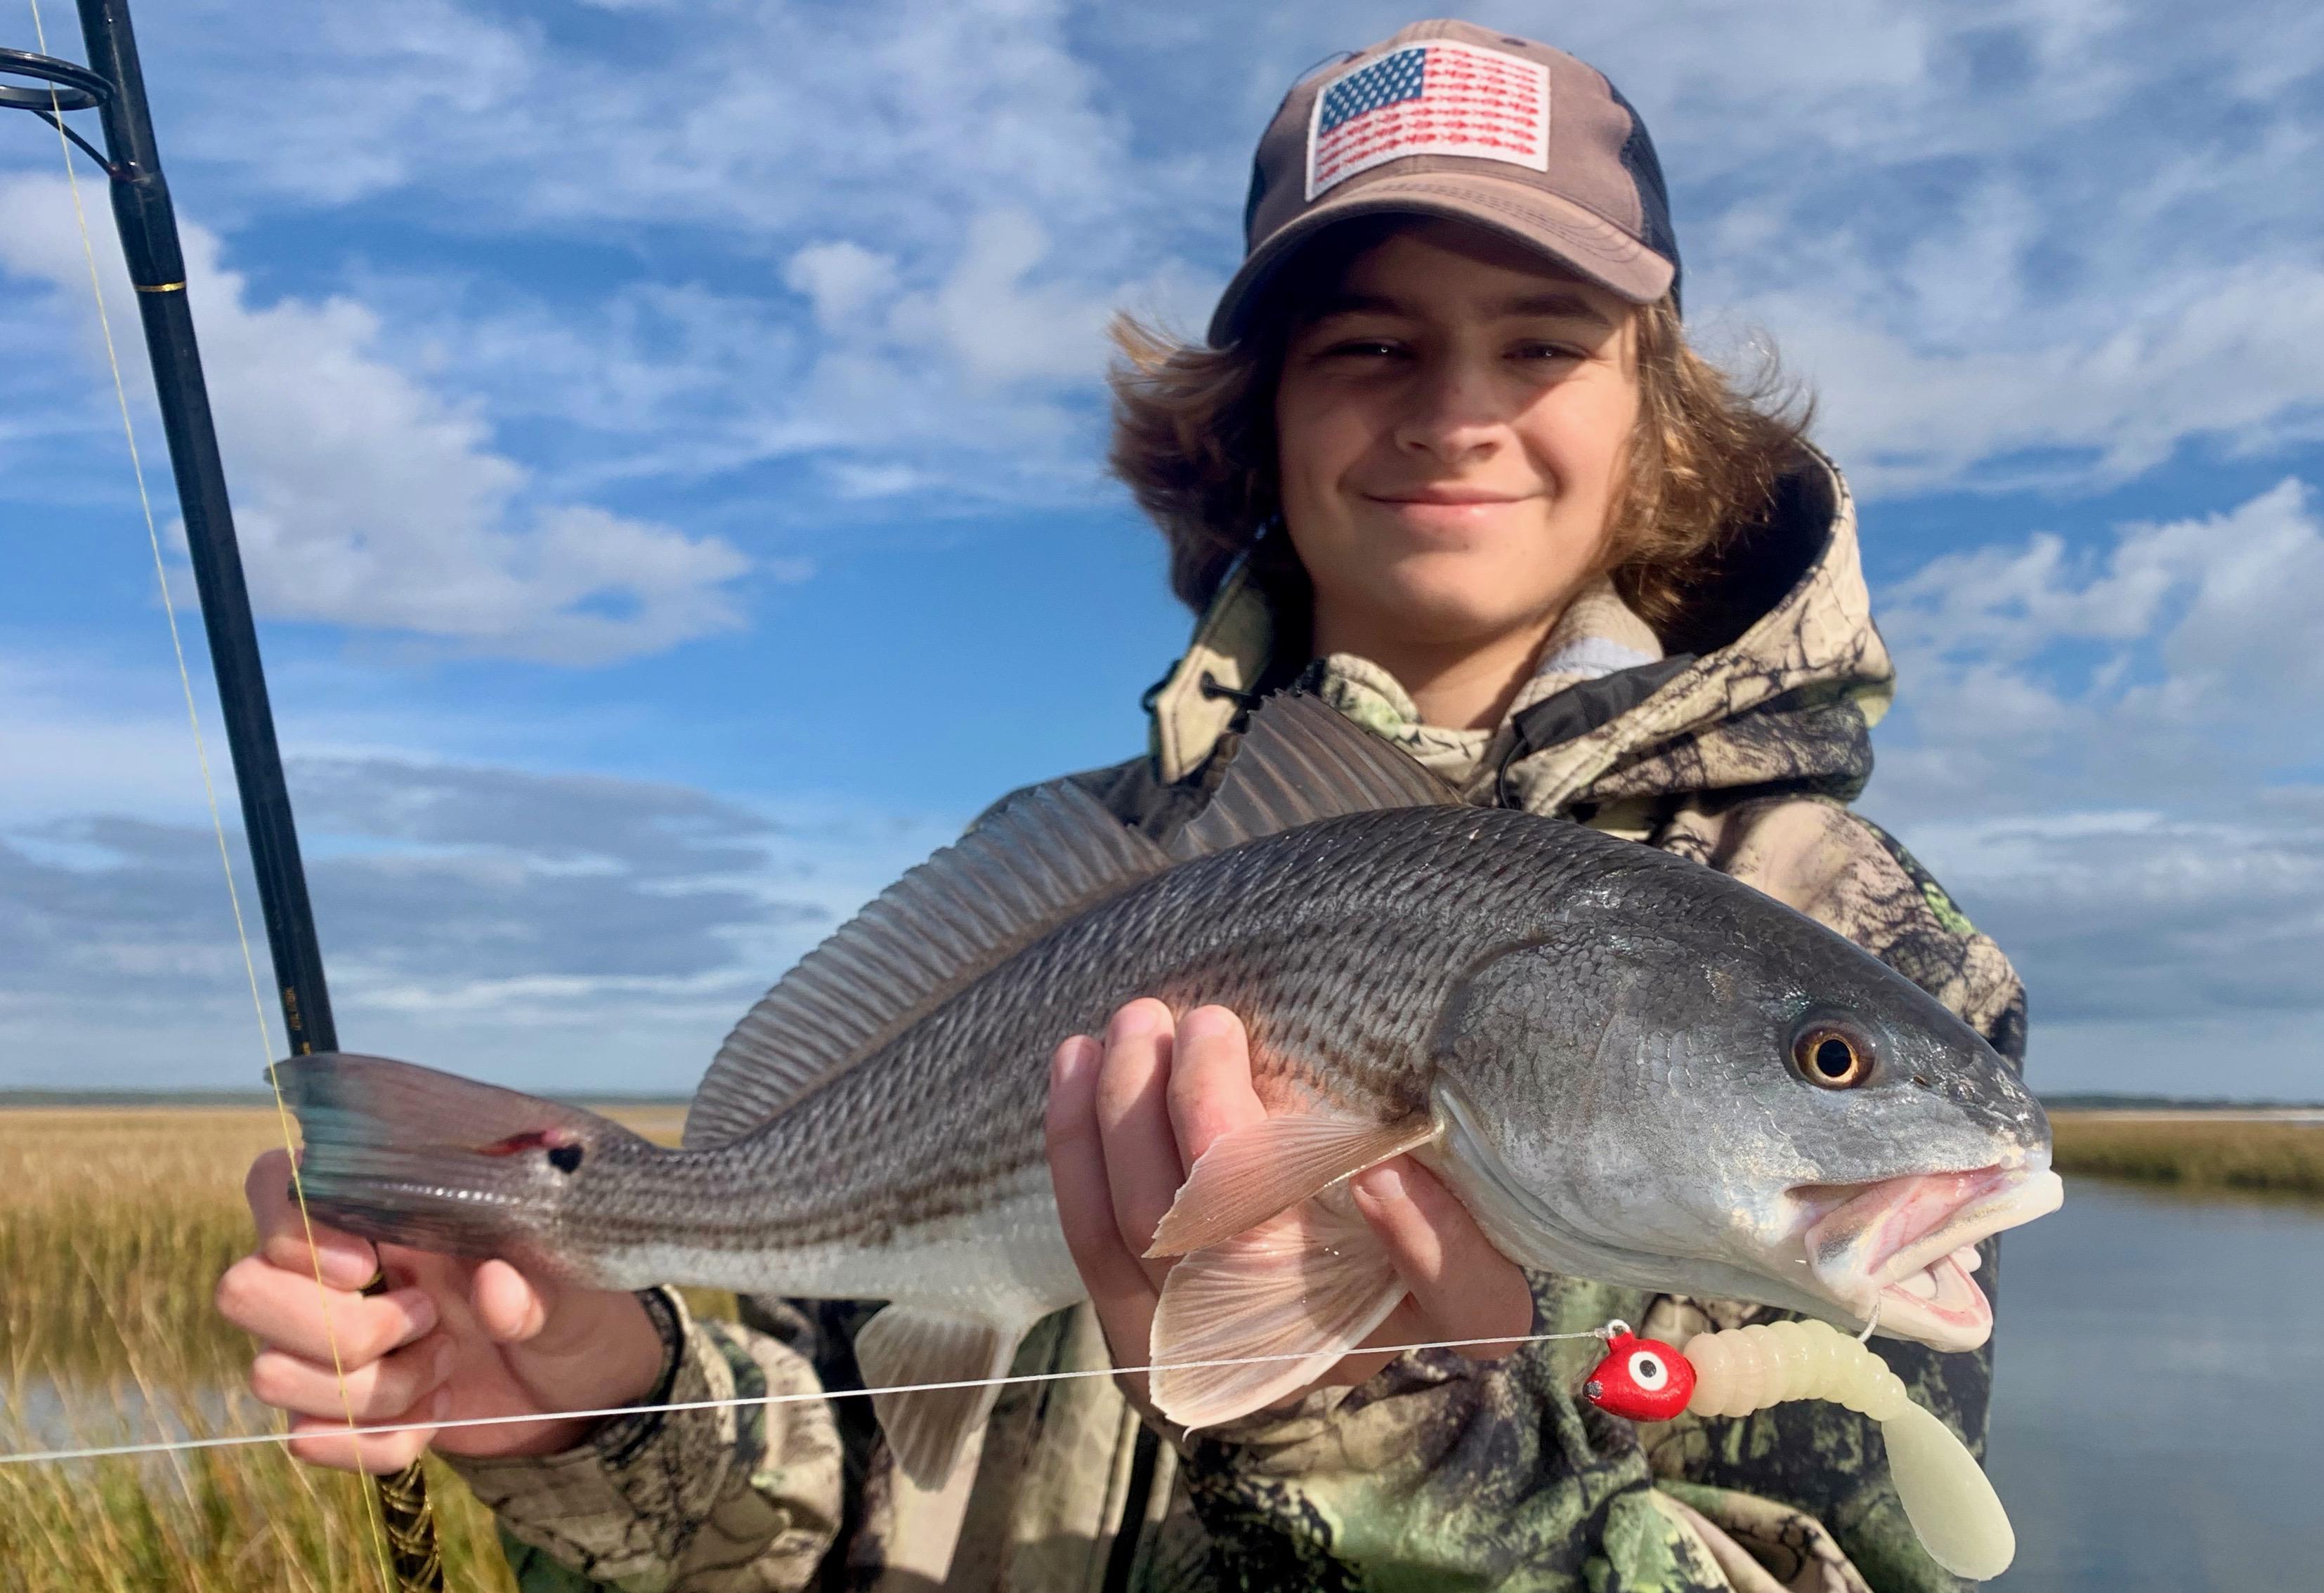 DOA Lures redfish south Carolina Captain Jordan Pate